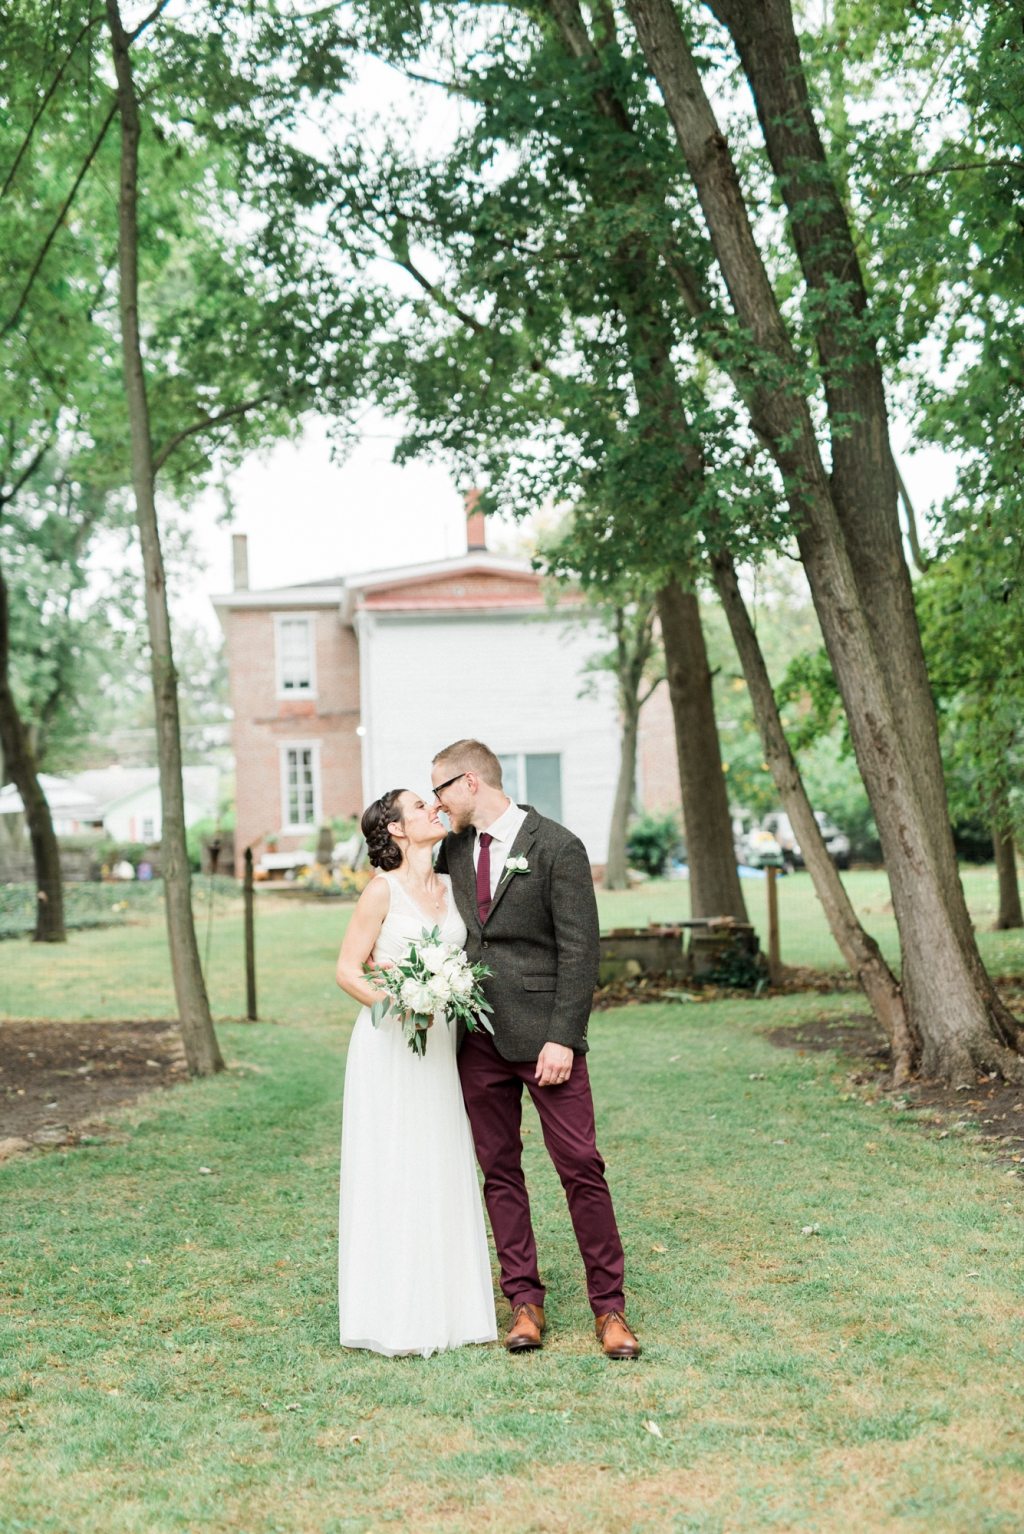 haley-richter-photography-new-jersey-backyard-wedding-105